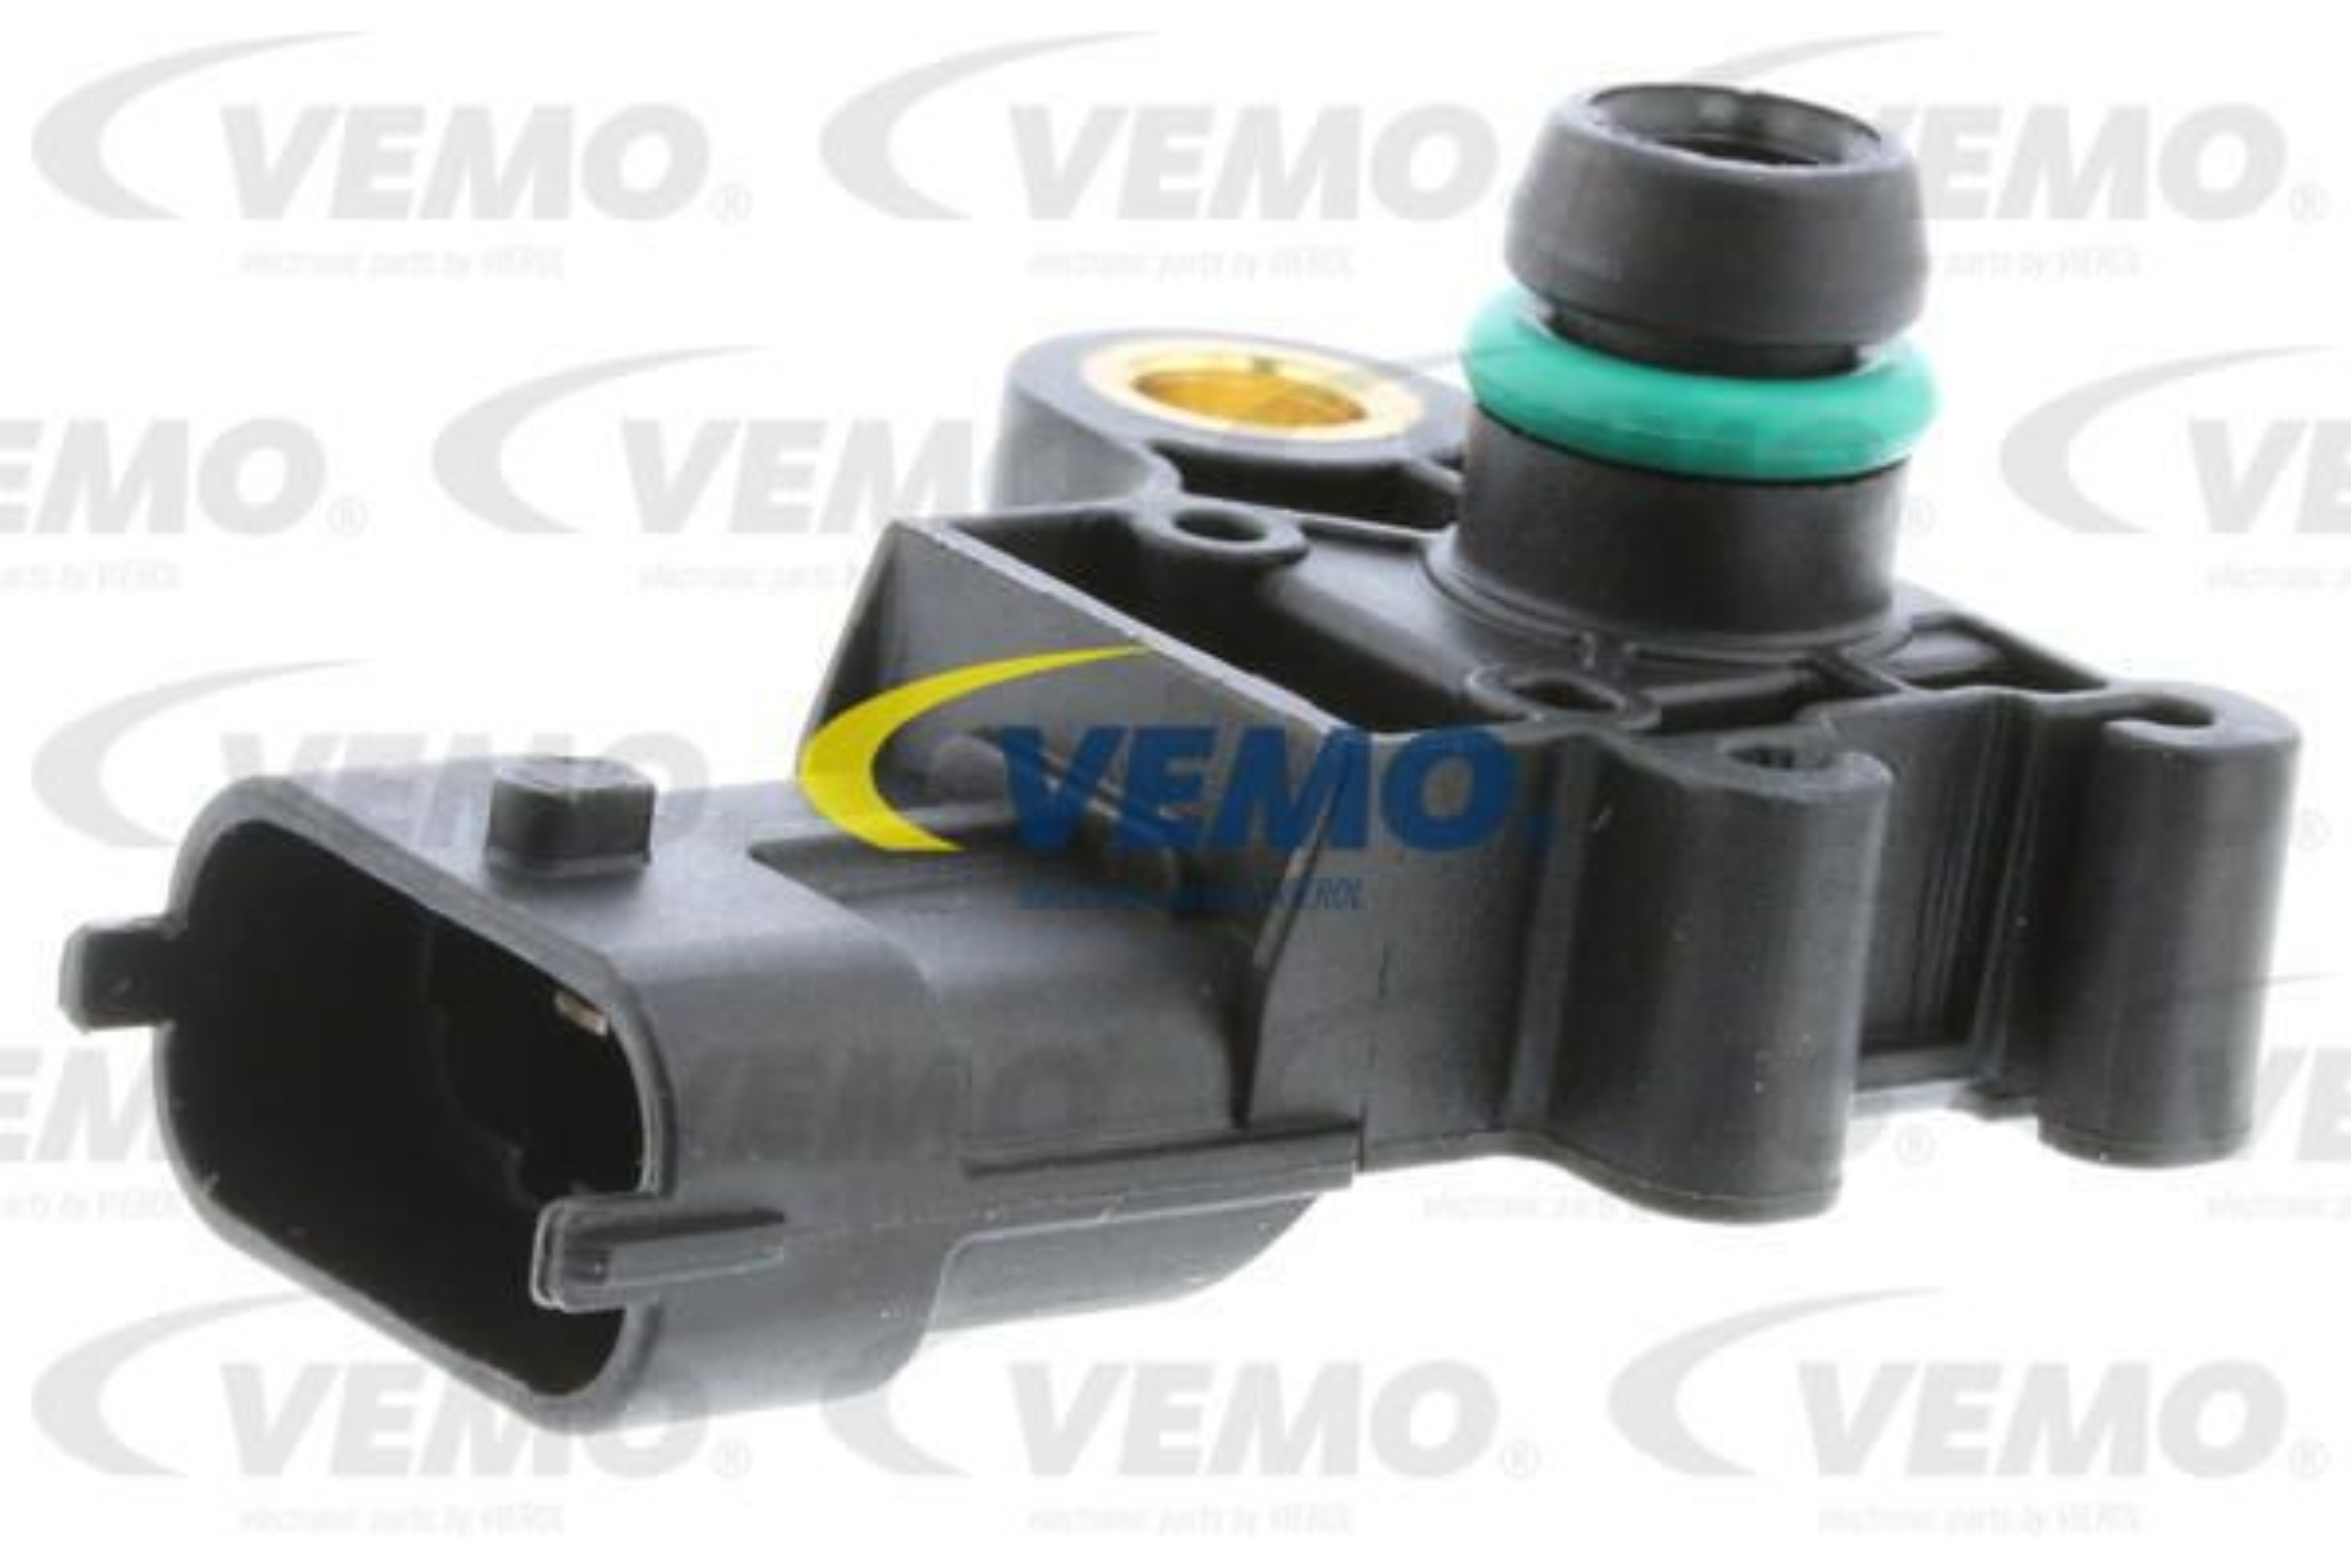 JAGUAR XK 2011 Saugrohrdruckfühler - Original VEMO V25-72-1095 Pol-Anzahl: 3-polig